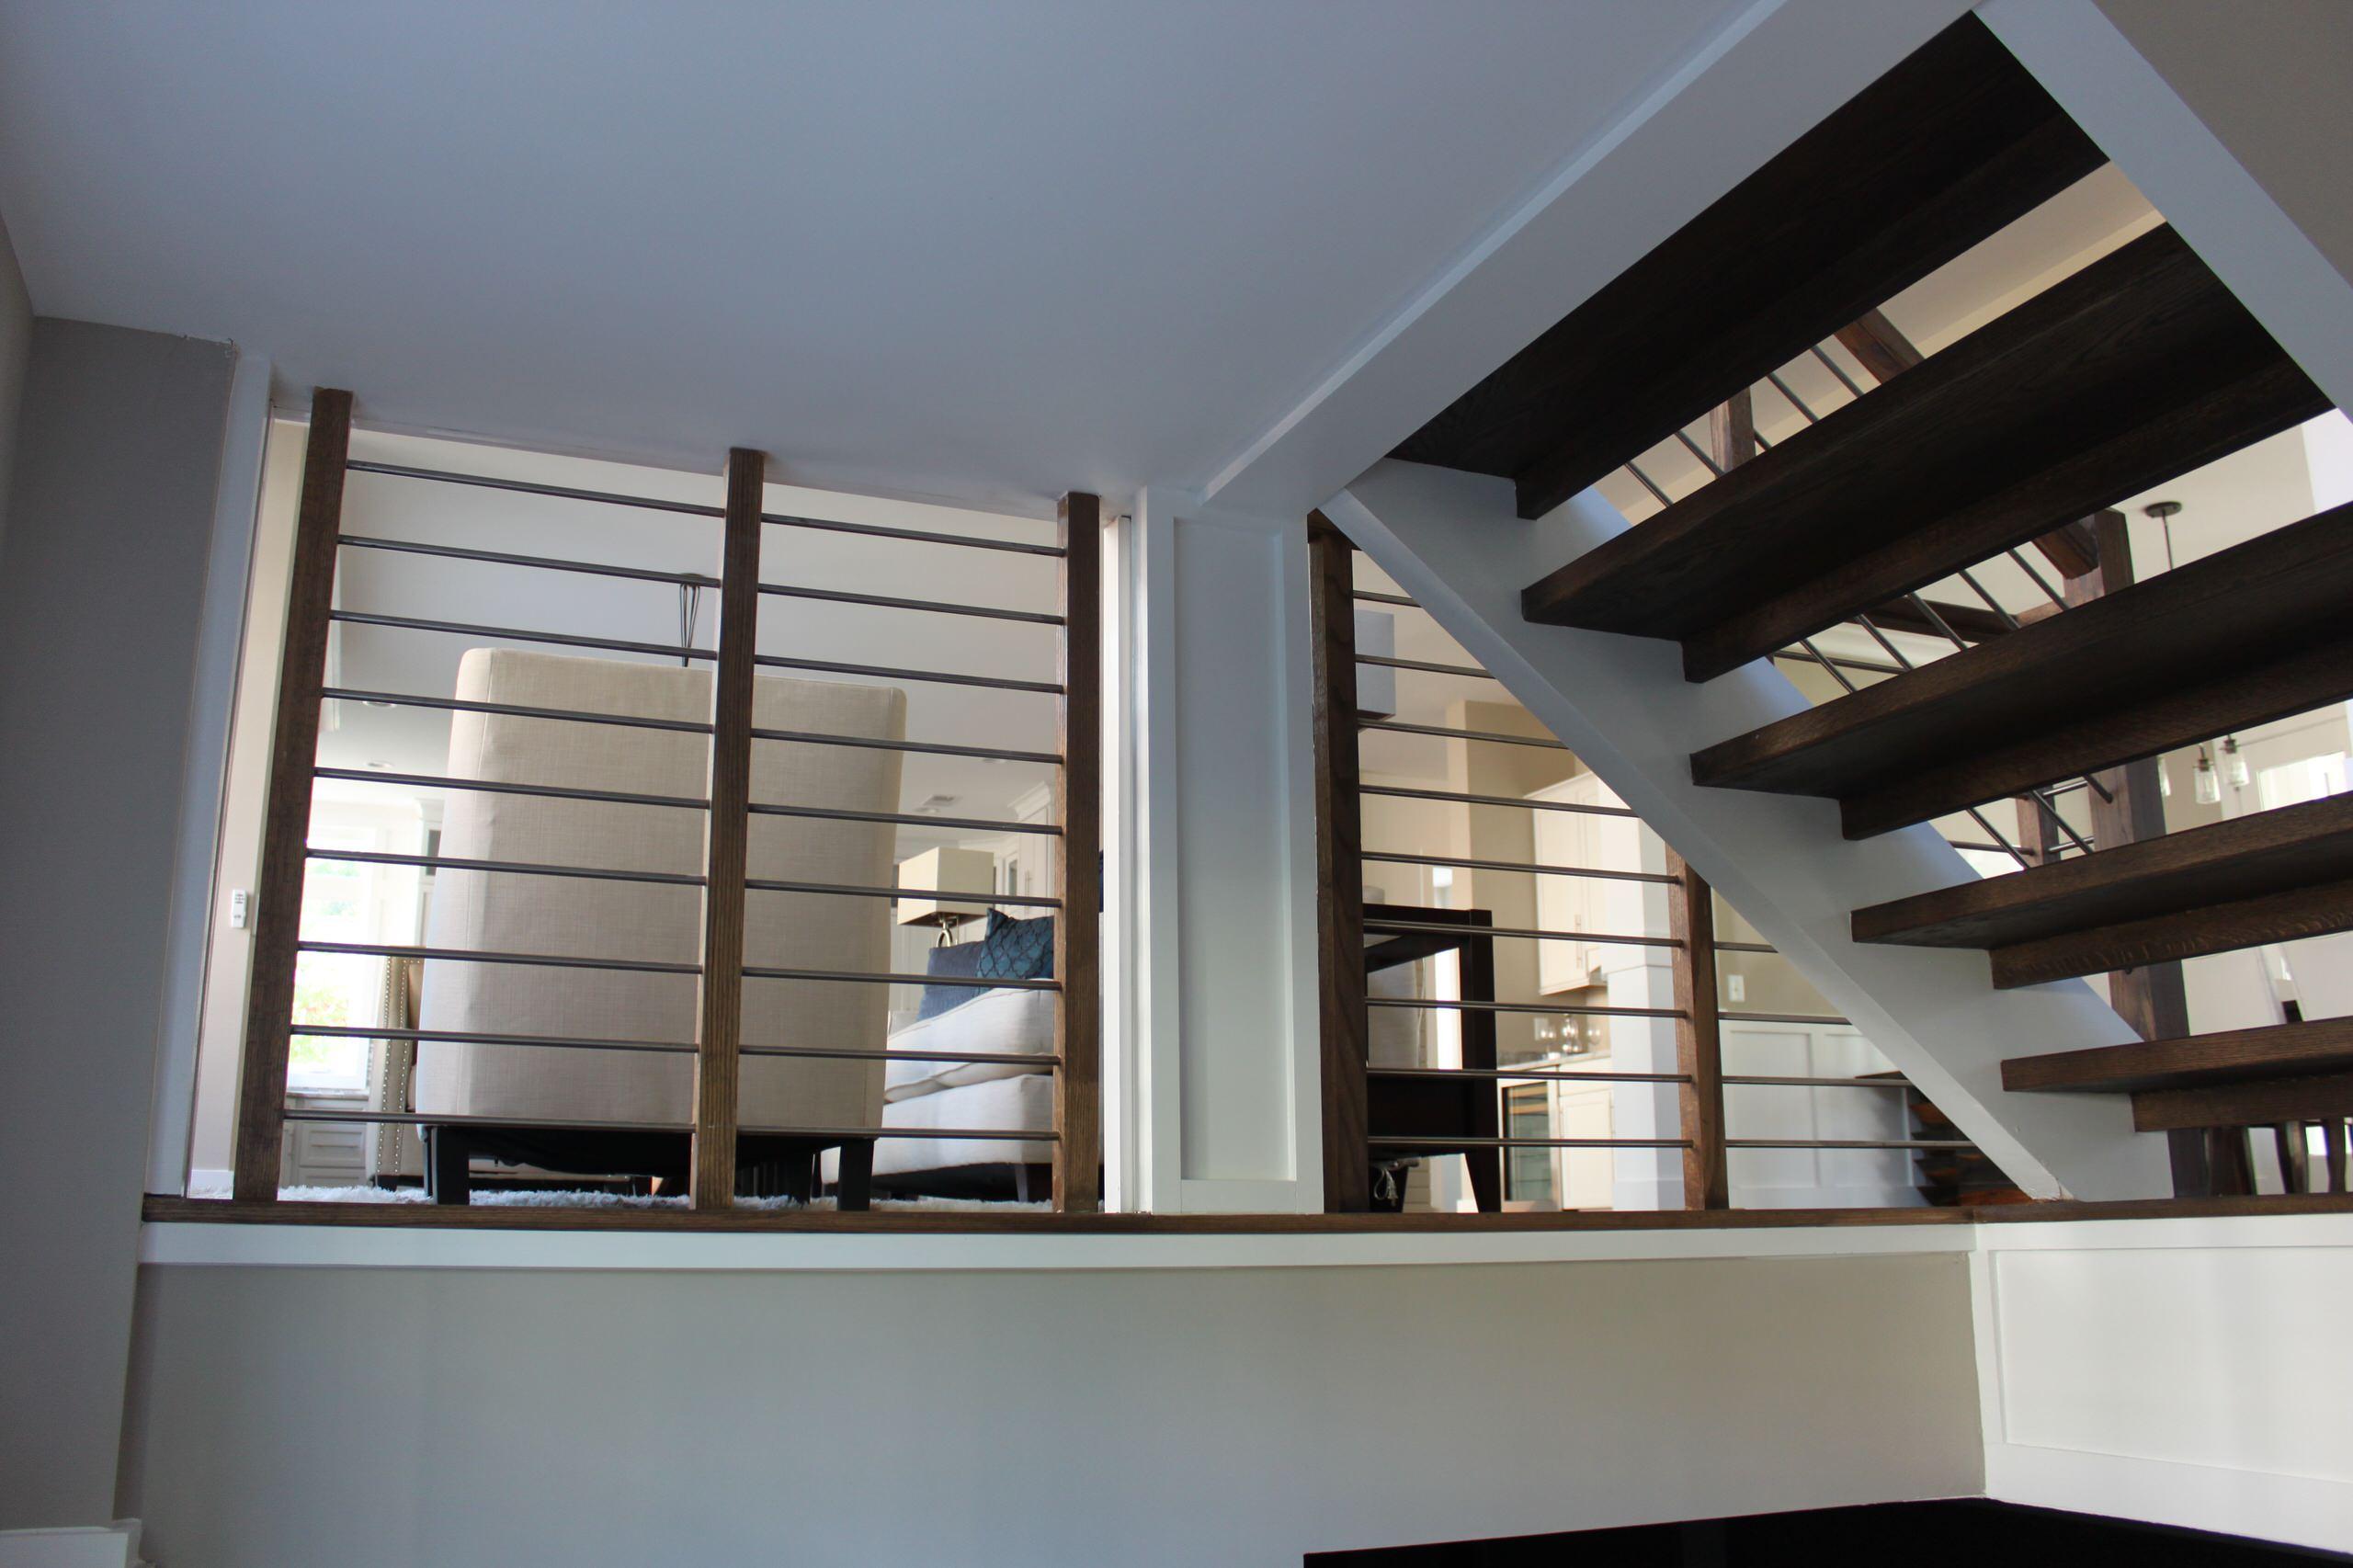 22_Stainless Steel & Dark Wooden Treads in Fabulous New Home, Vienna, VA 22180